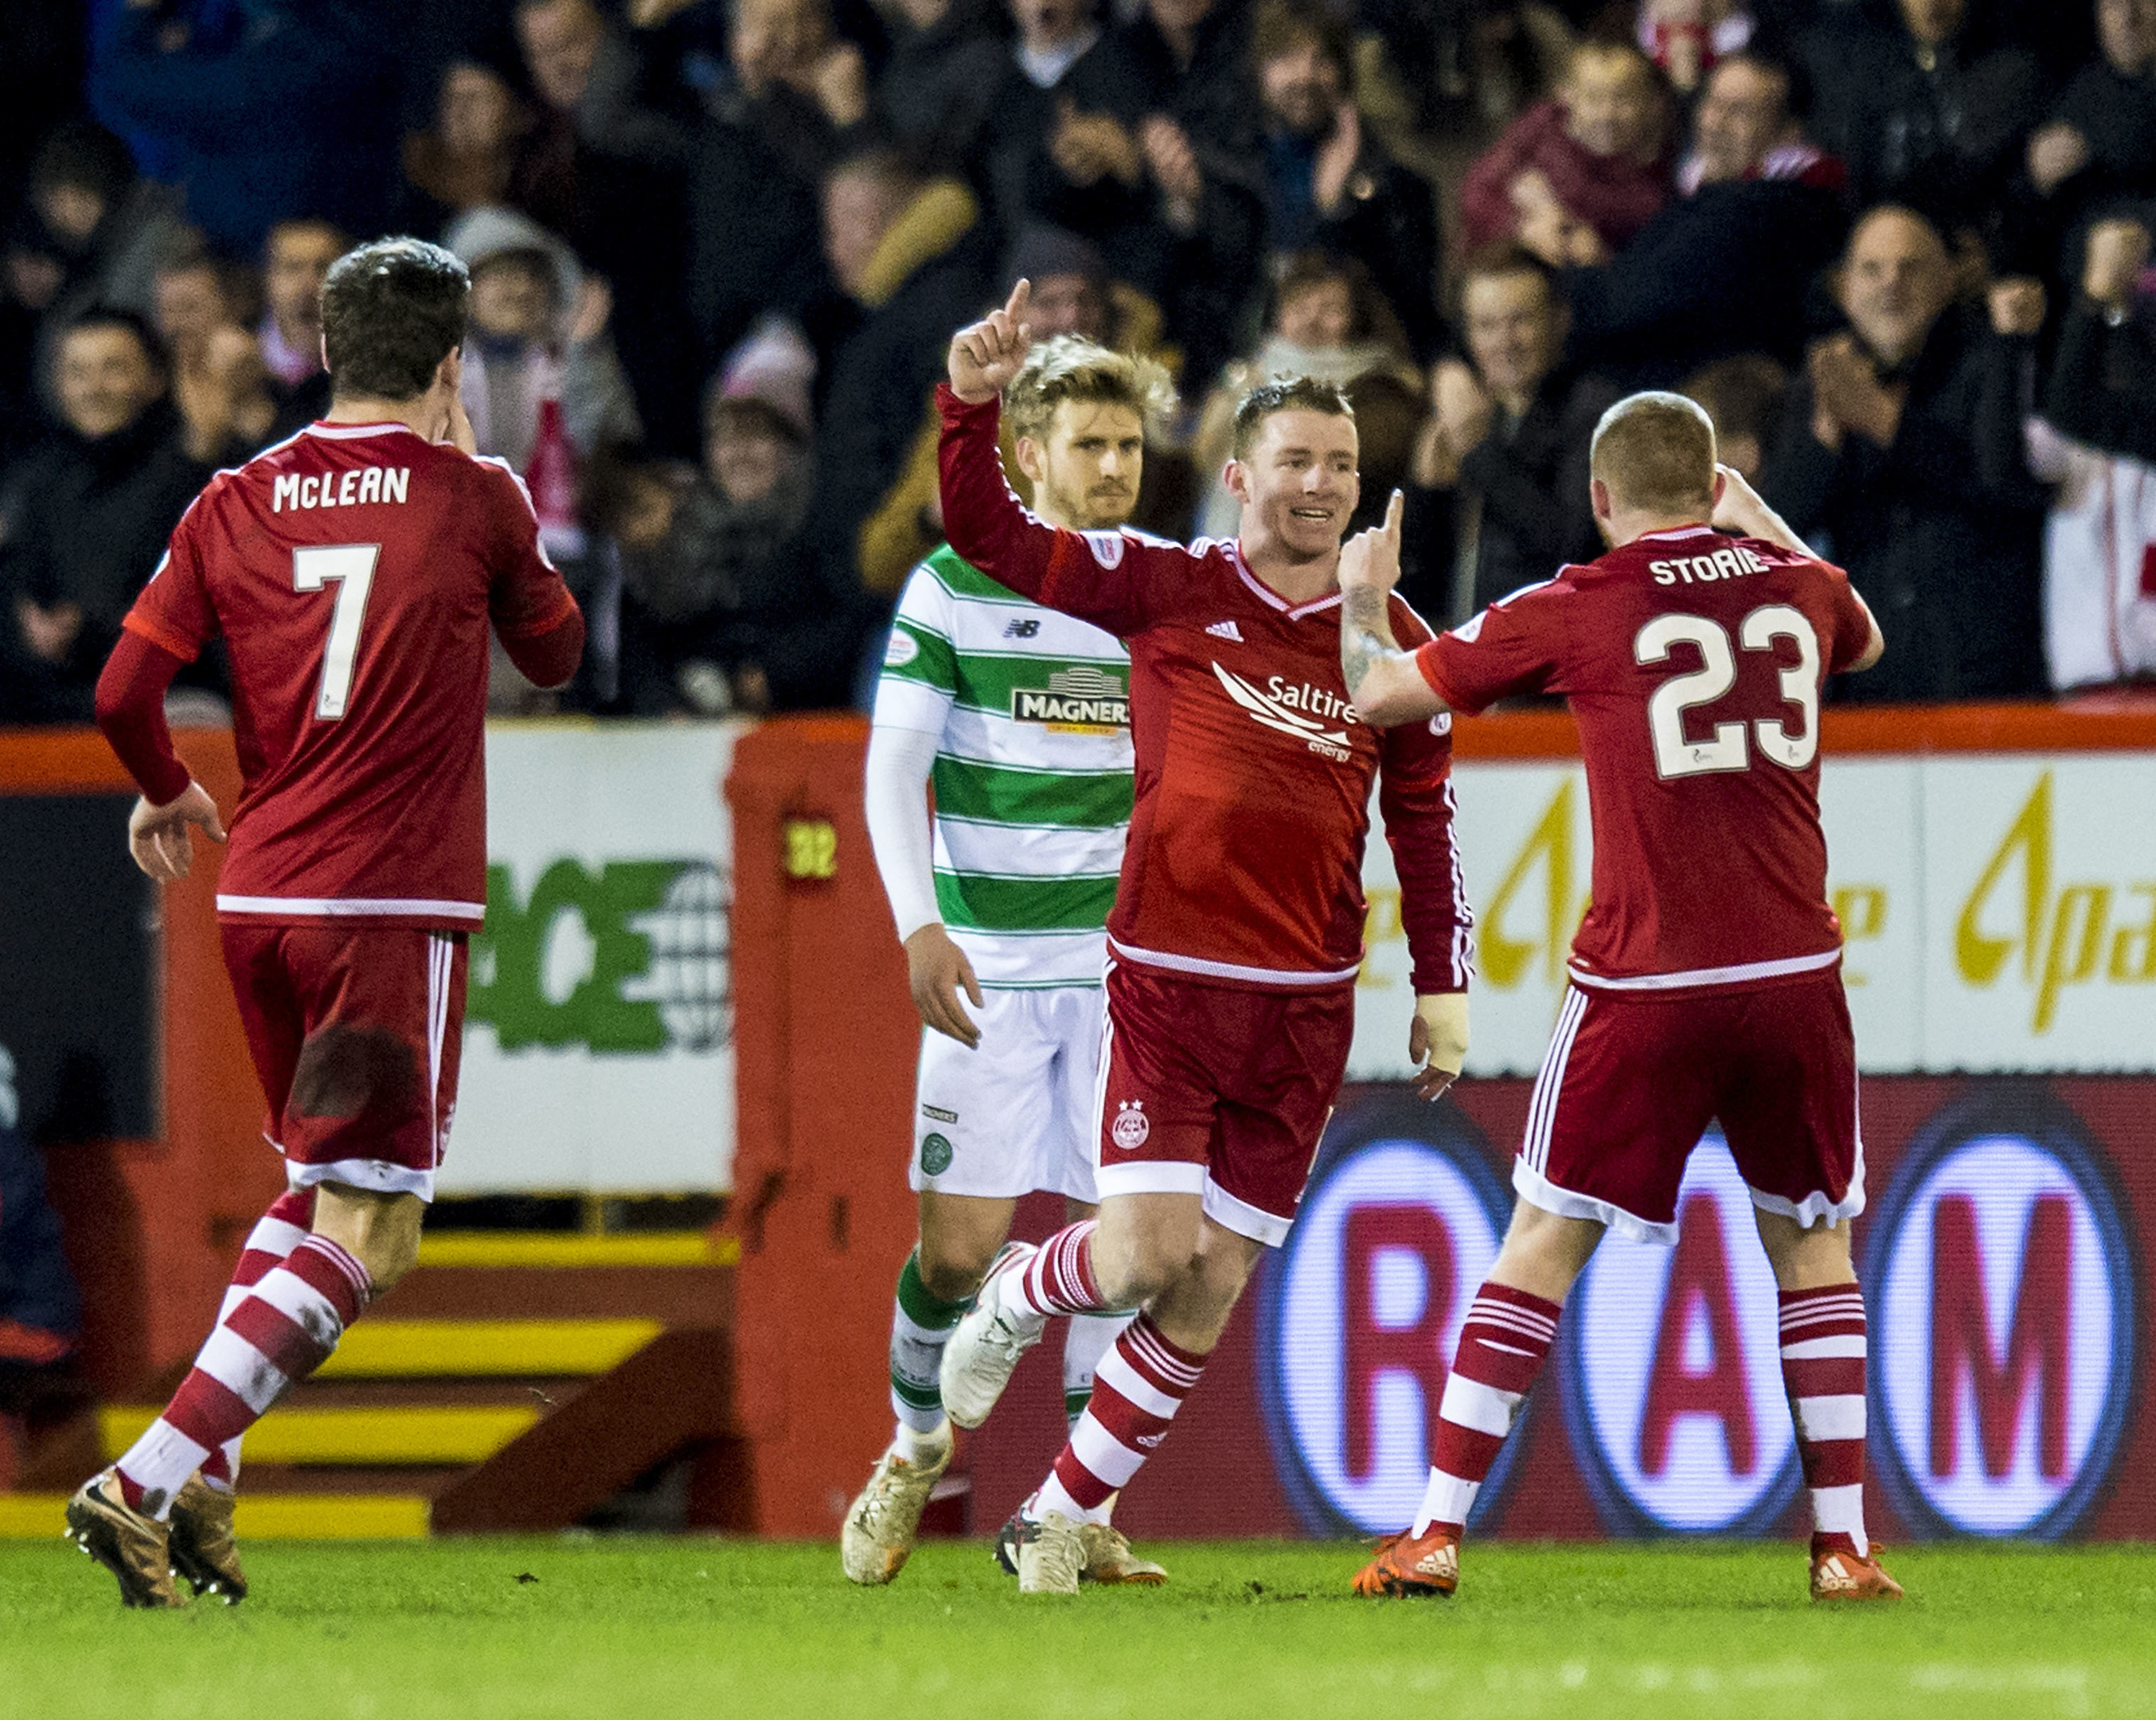 Aberdeen's Jonny Hayes celebrates his 2014 goal against Celtic.